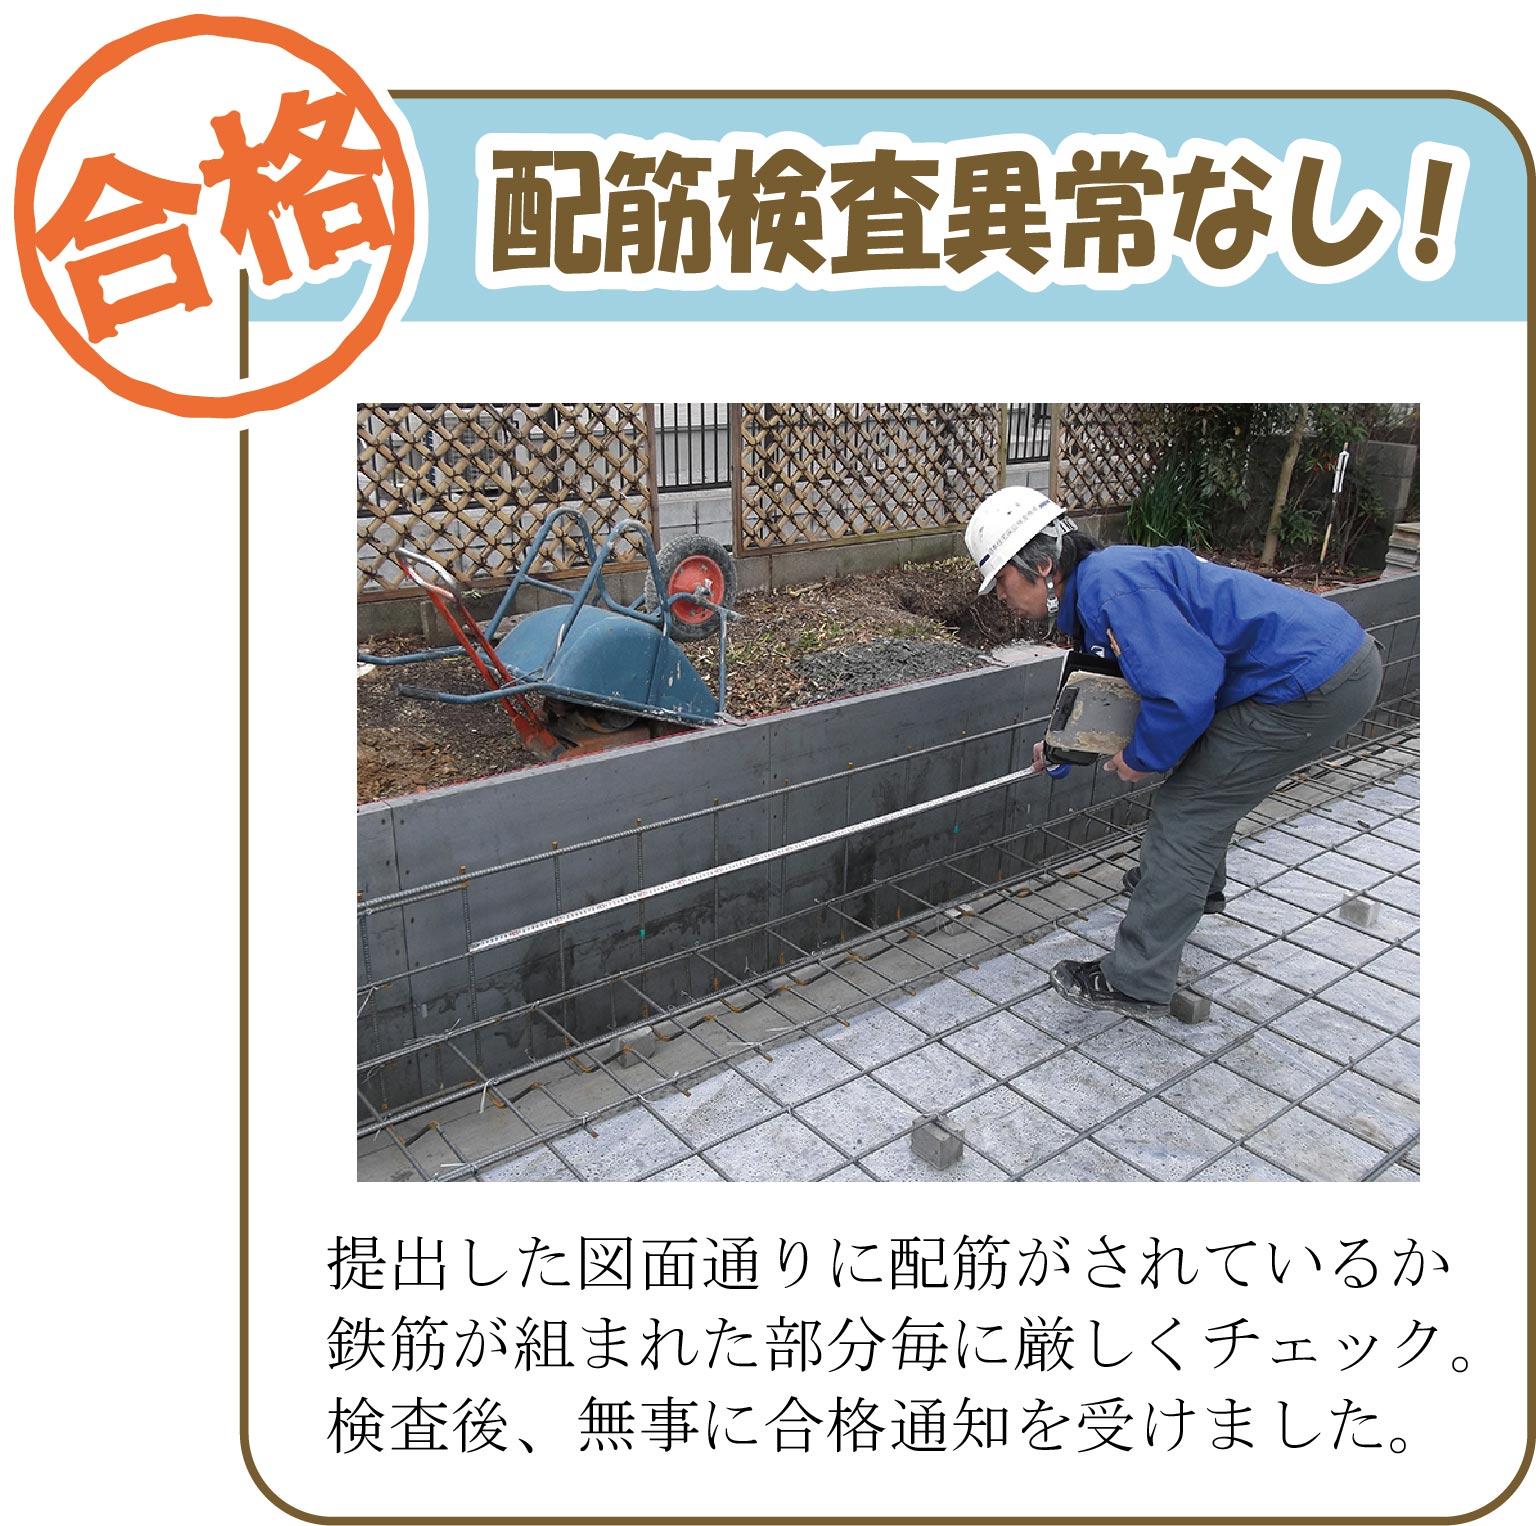 KuraSi-natu-sin93-08.jpg